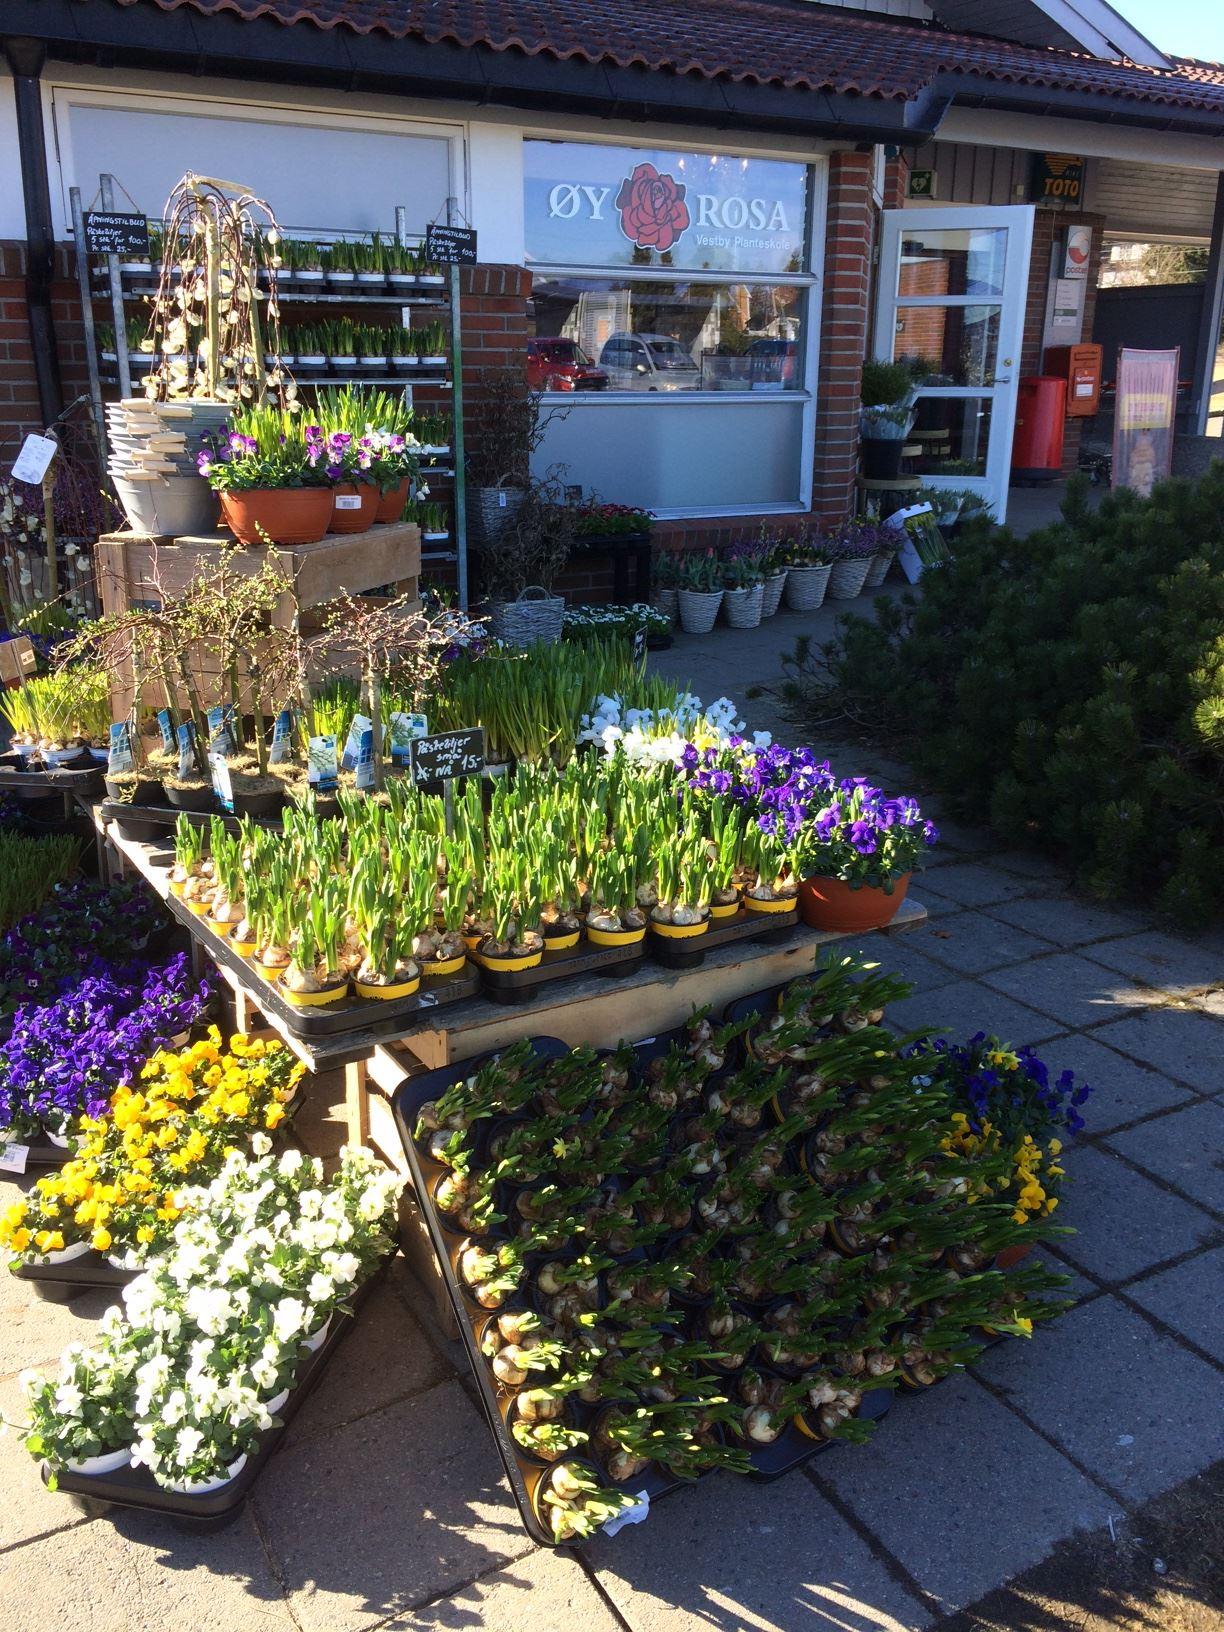 Øyrosa Blomsterbutikk Sarpsborg